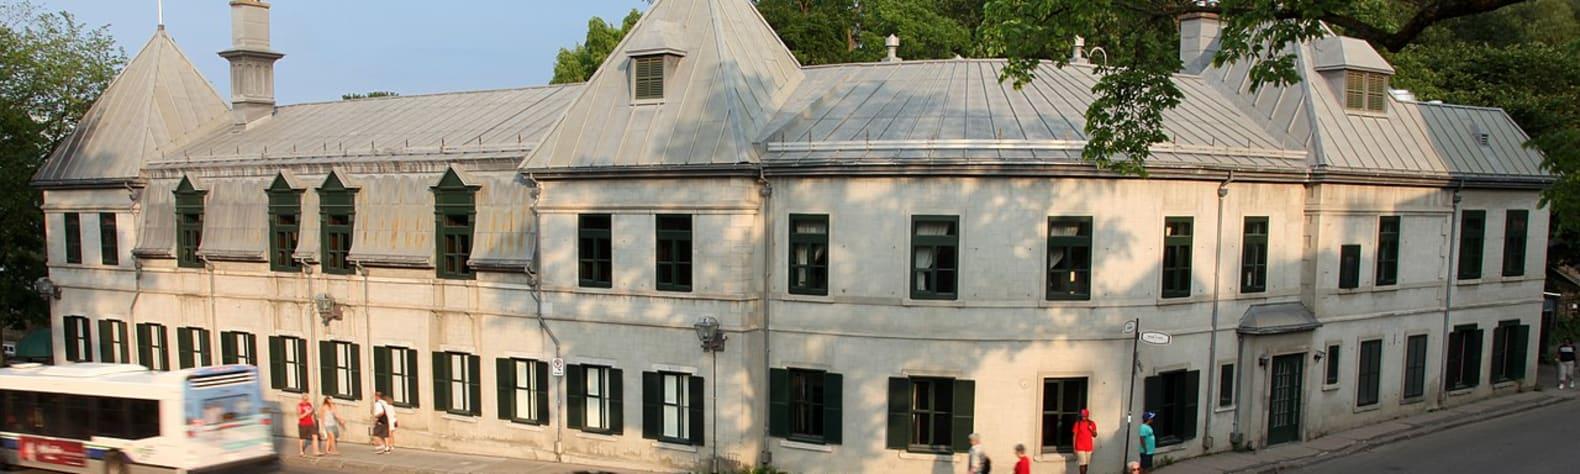 Québec Garrison Club National Historic Site